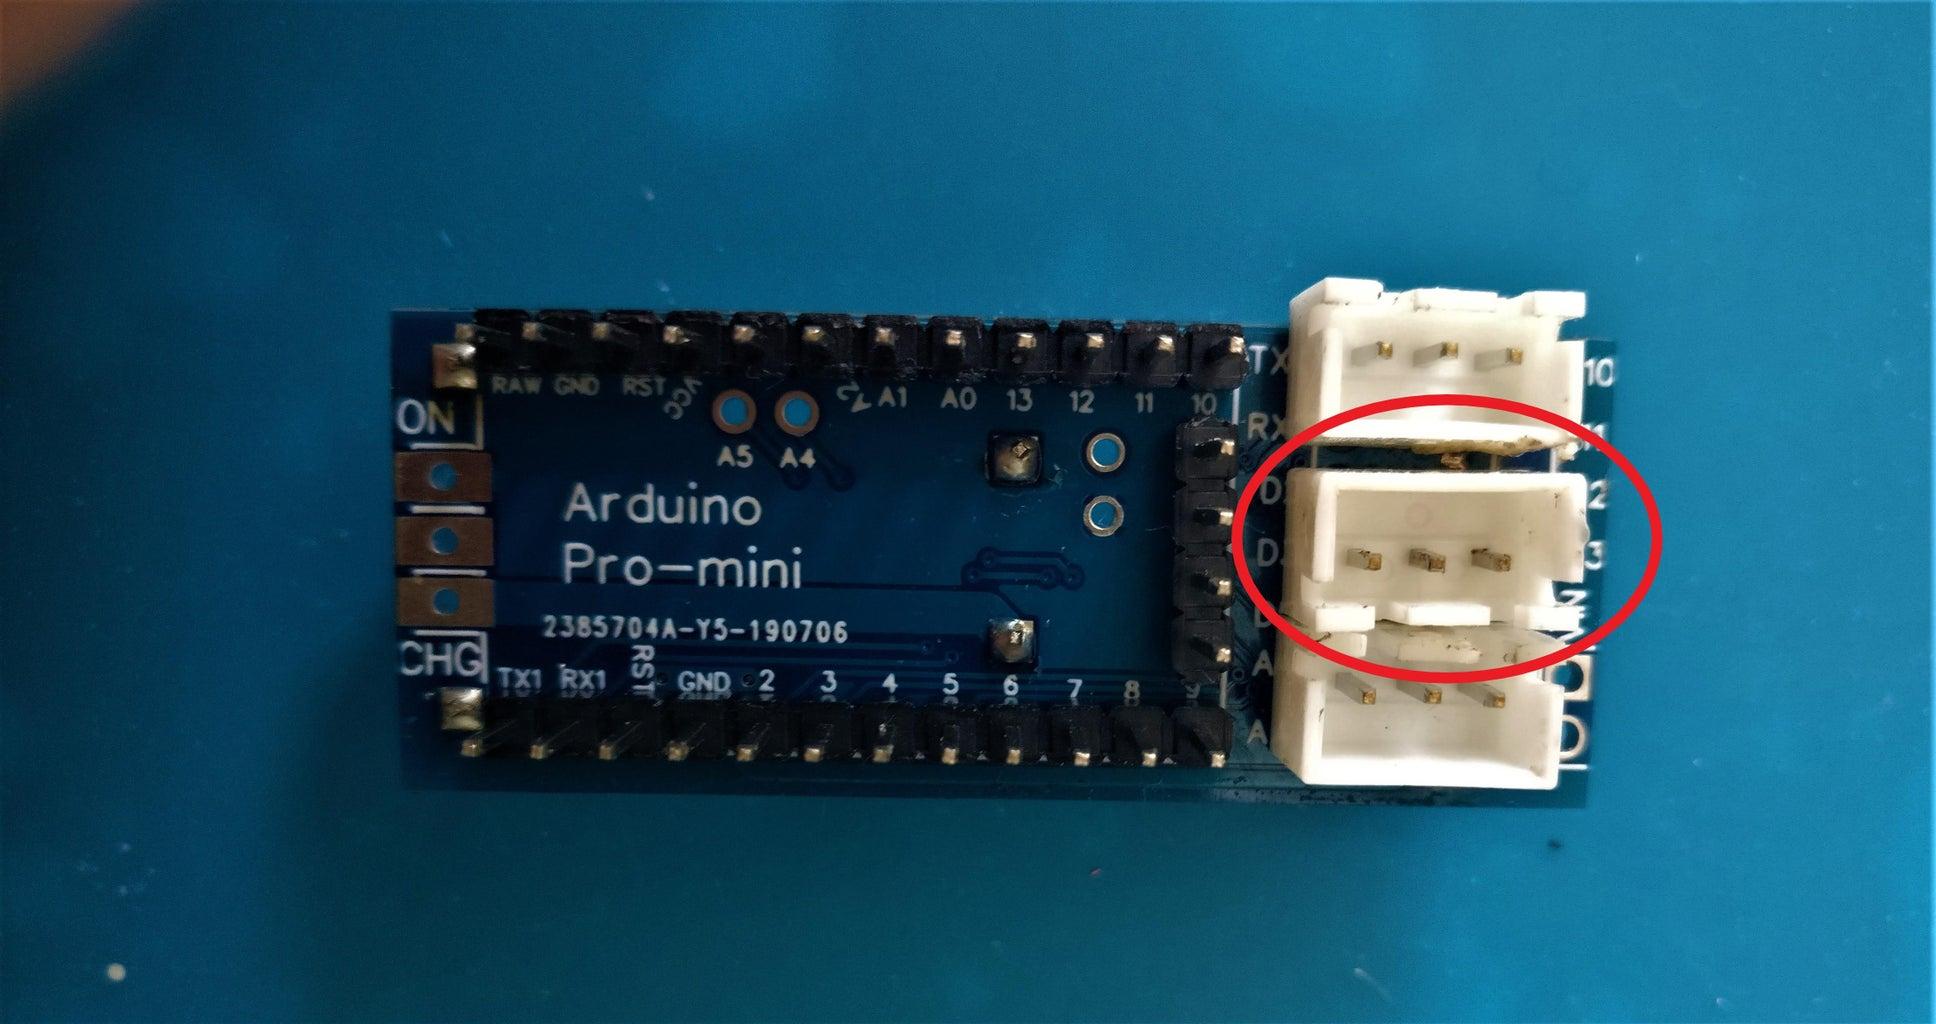 Controller Contruction Step 5: